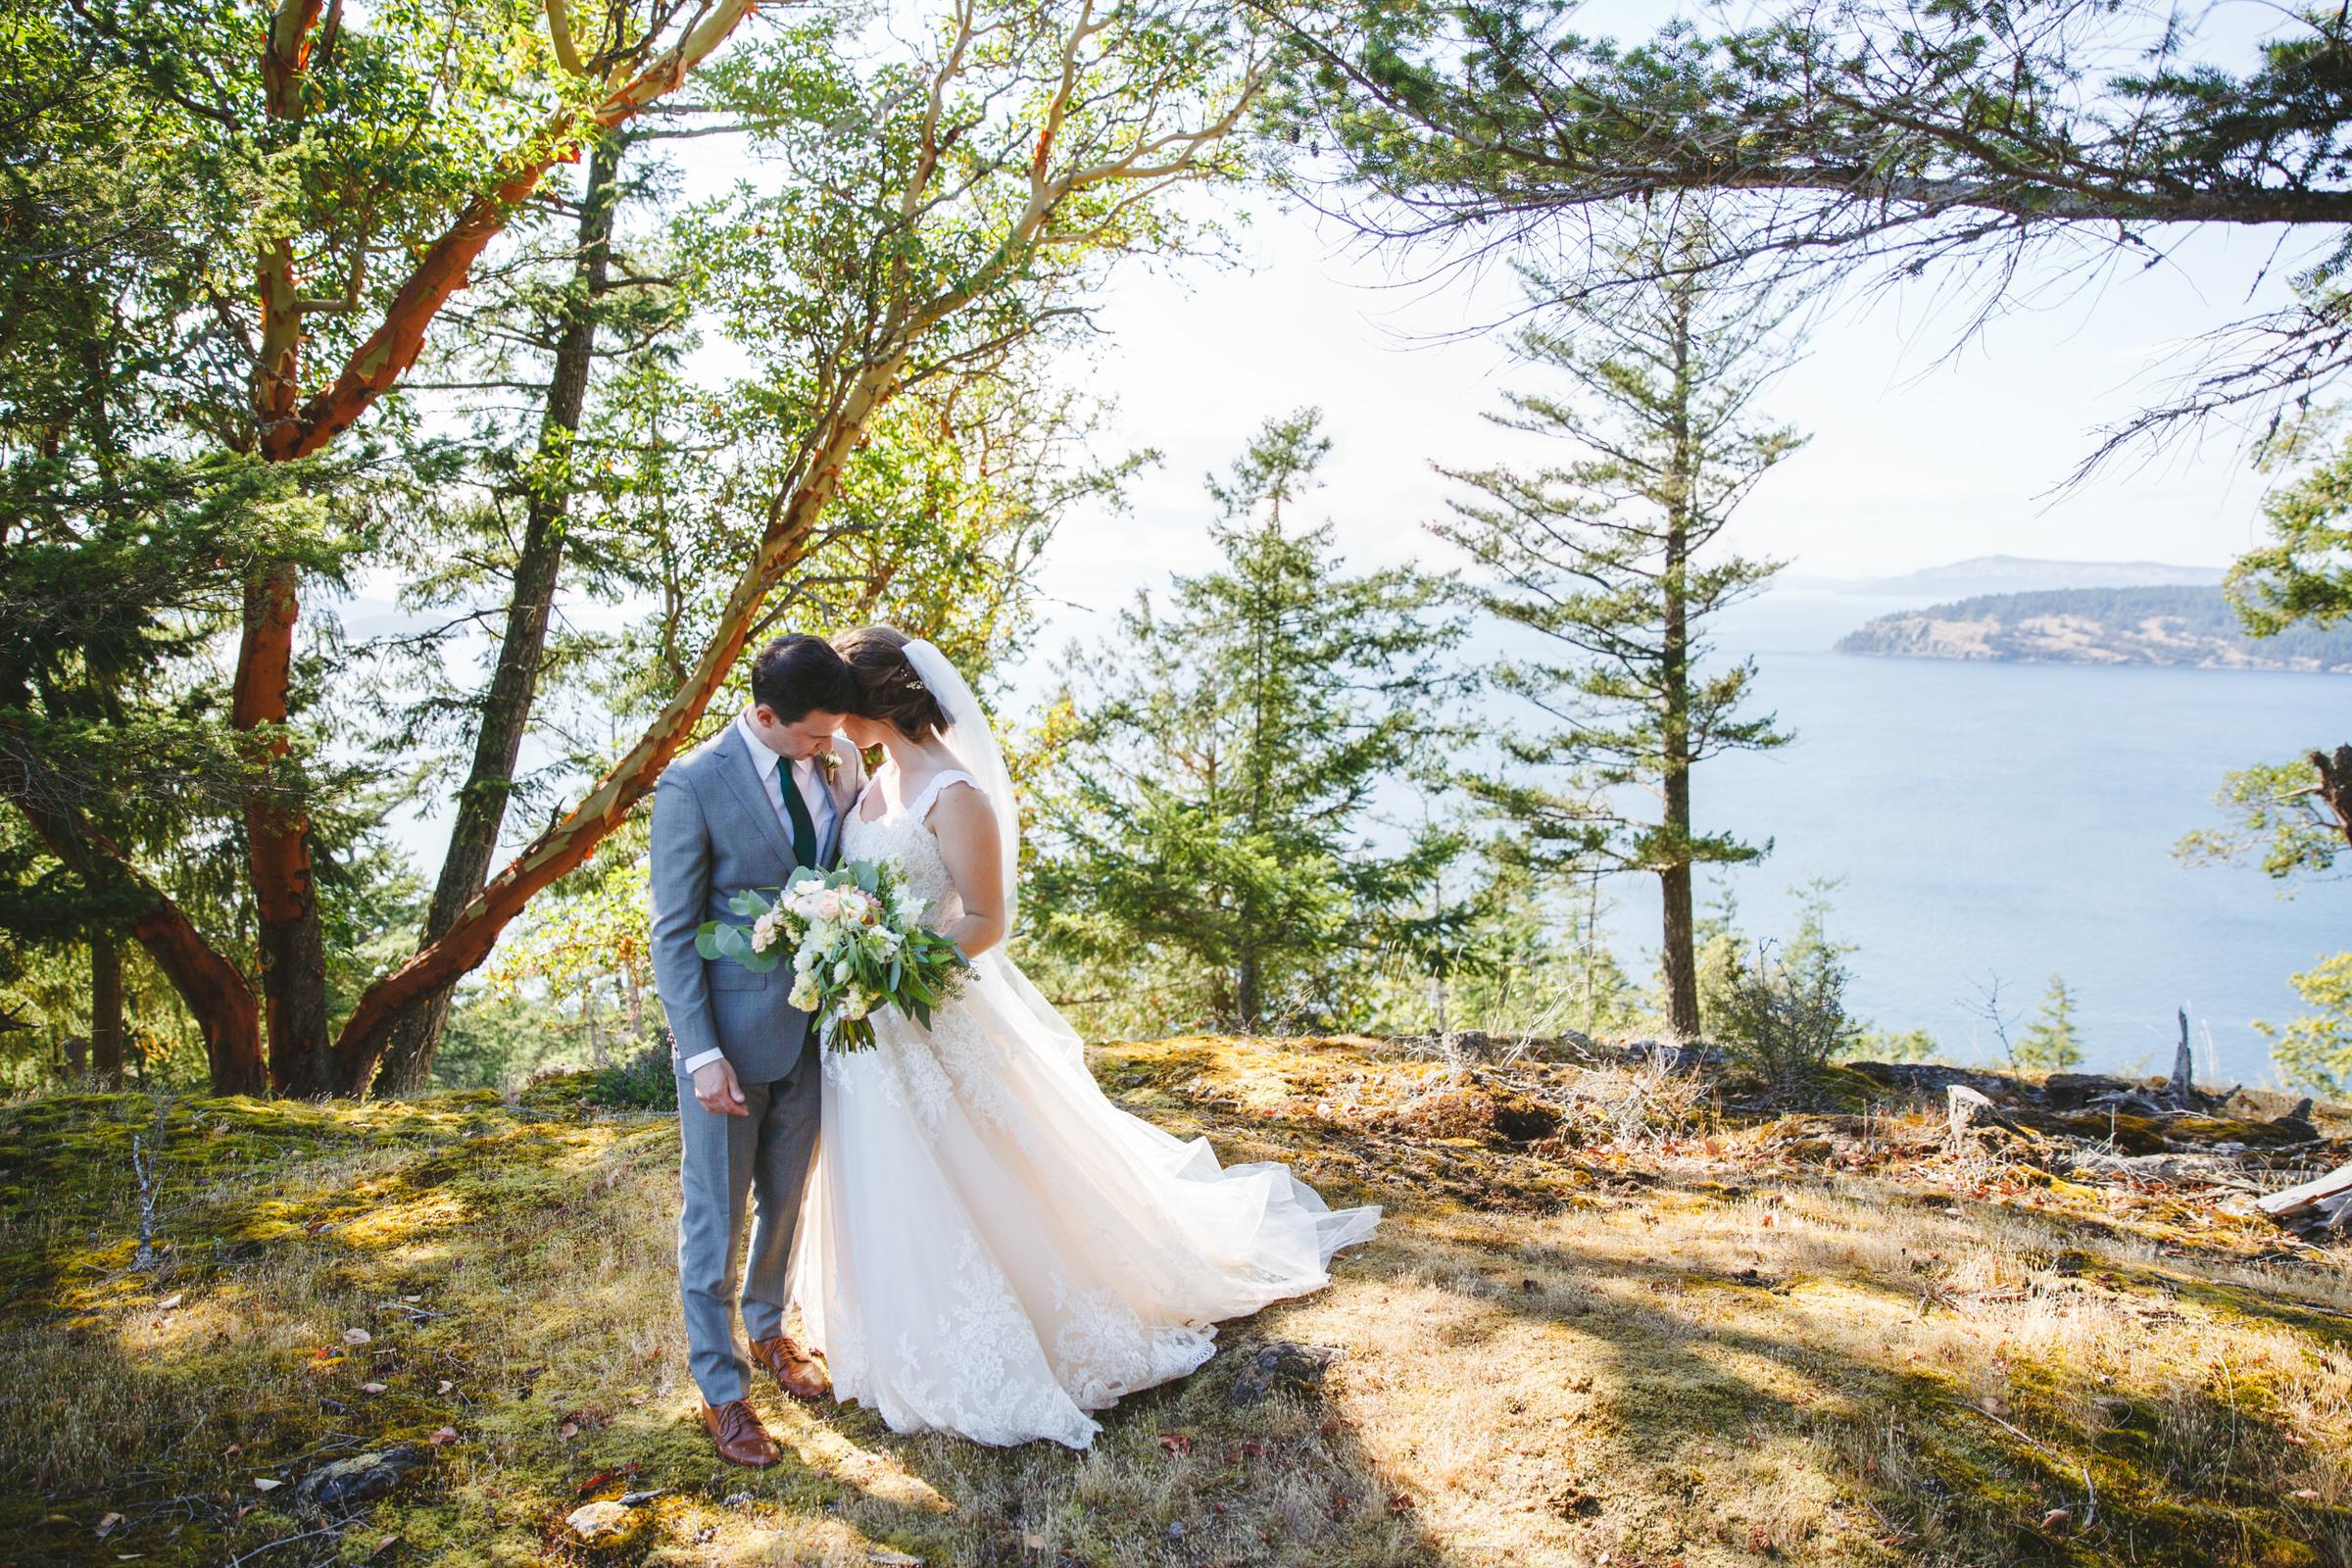 Island couple portrait - photo by Satya Curcio Photography